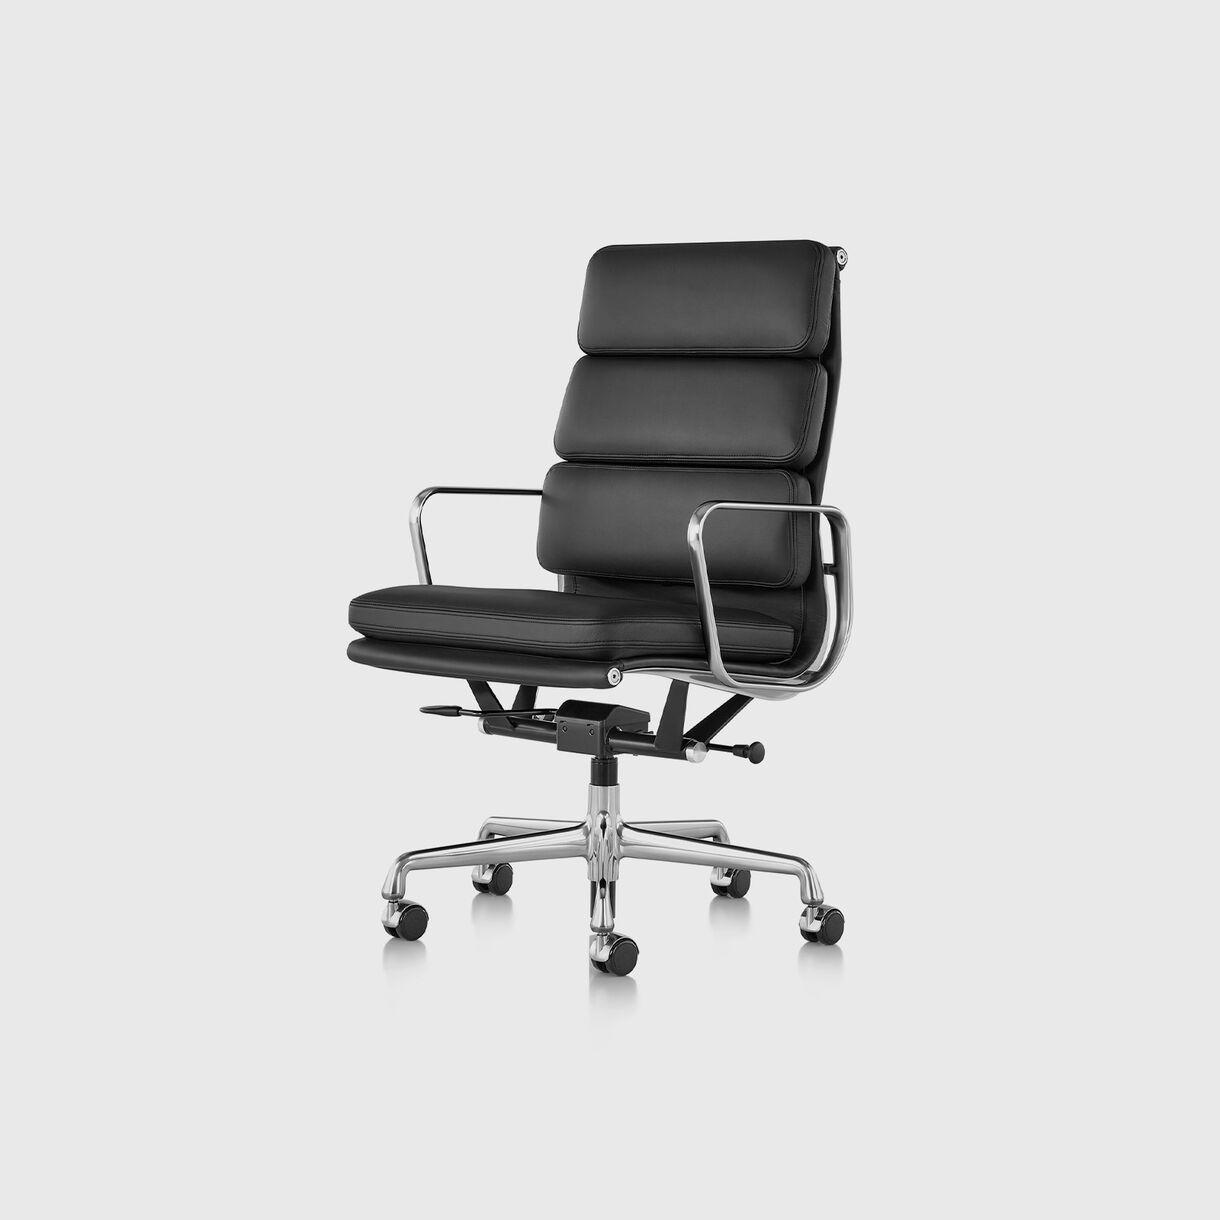 Eames Soft Pad Group Executive Chair, Black Leather & Polished Aluminium